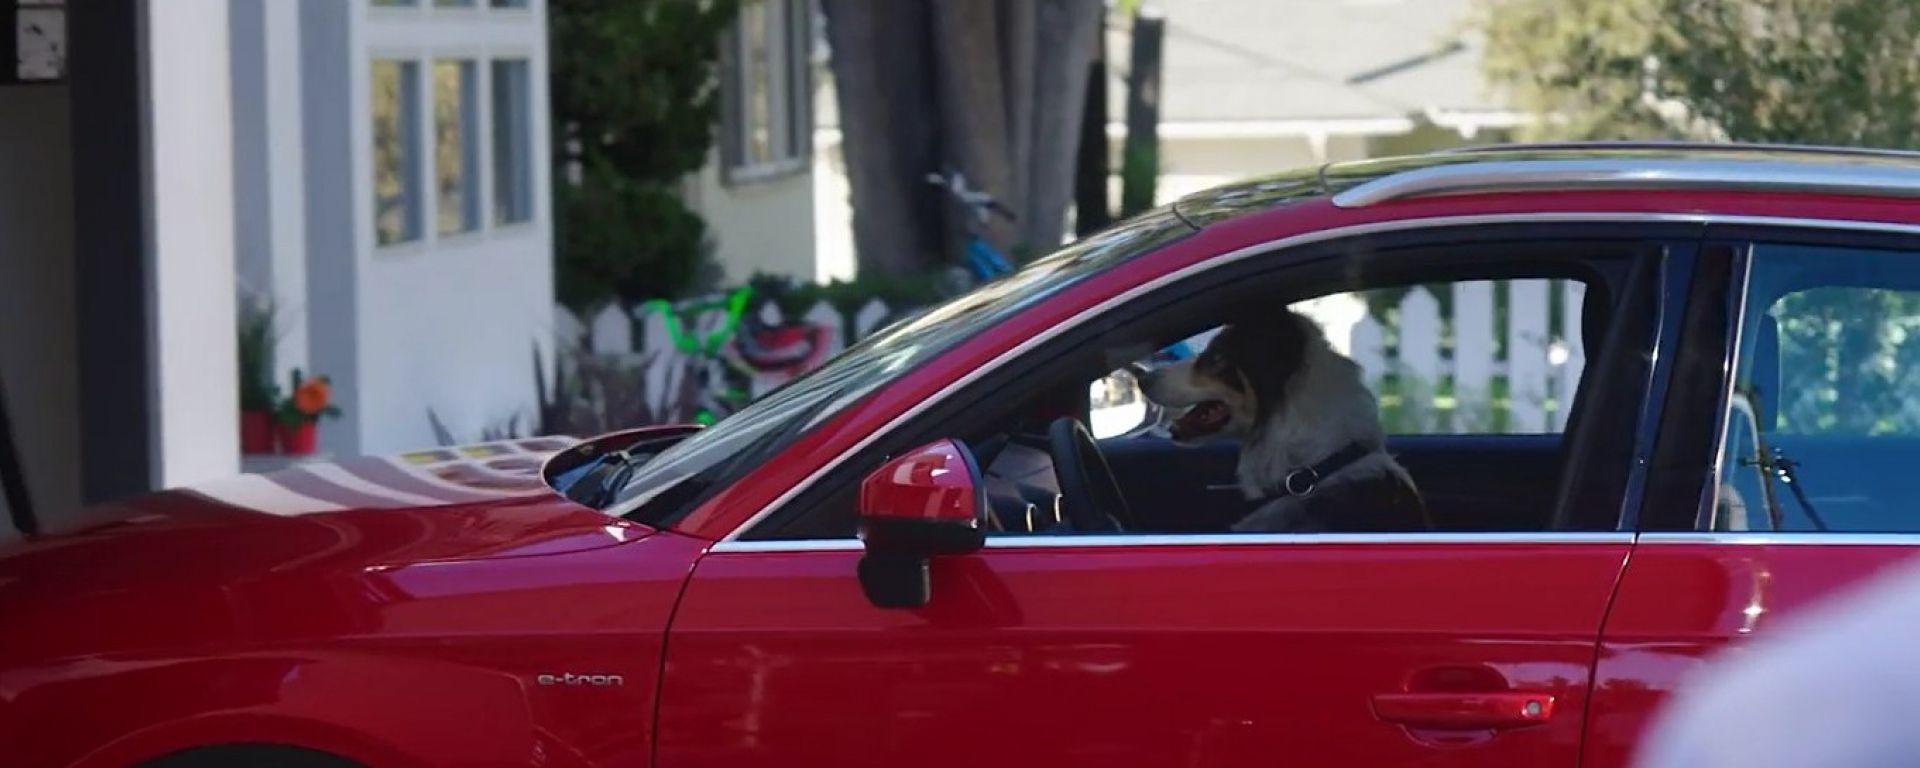 Audi: parcheggi e ricarica high tech